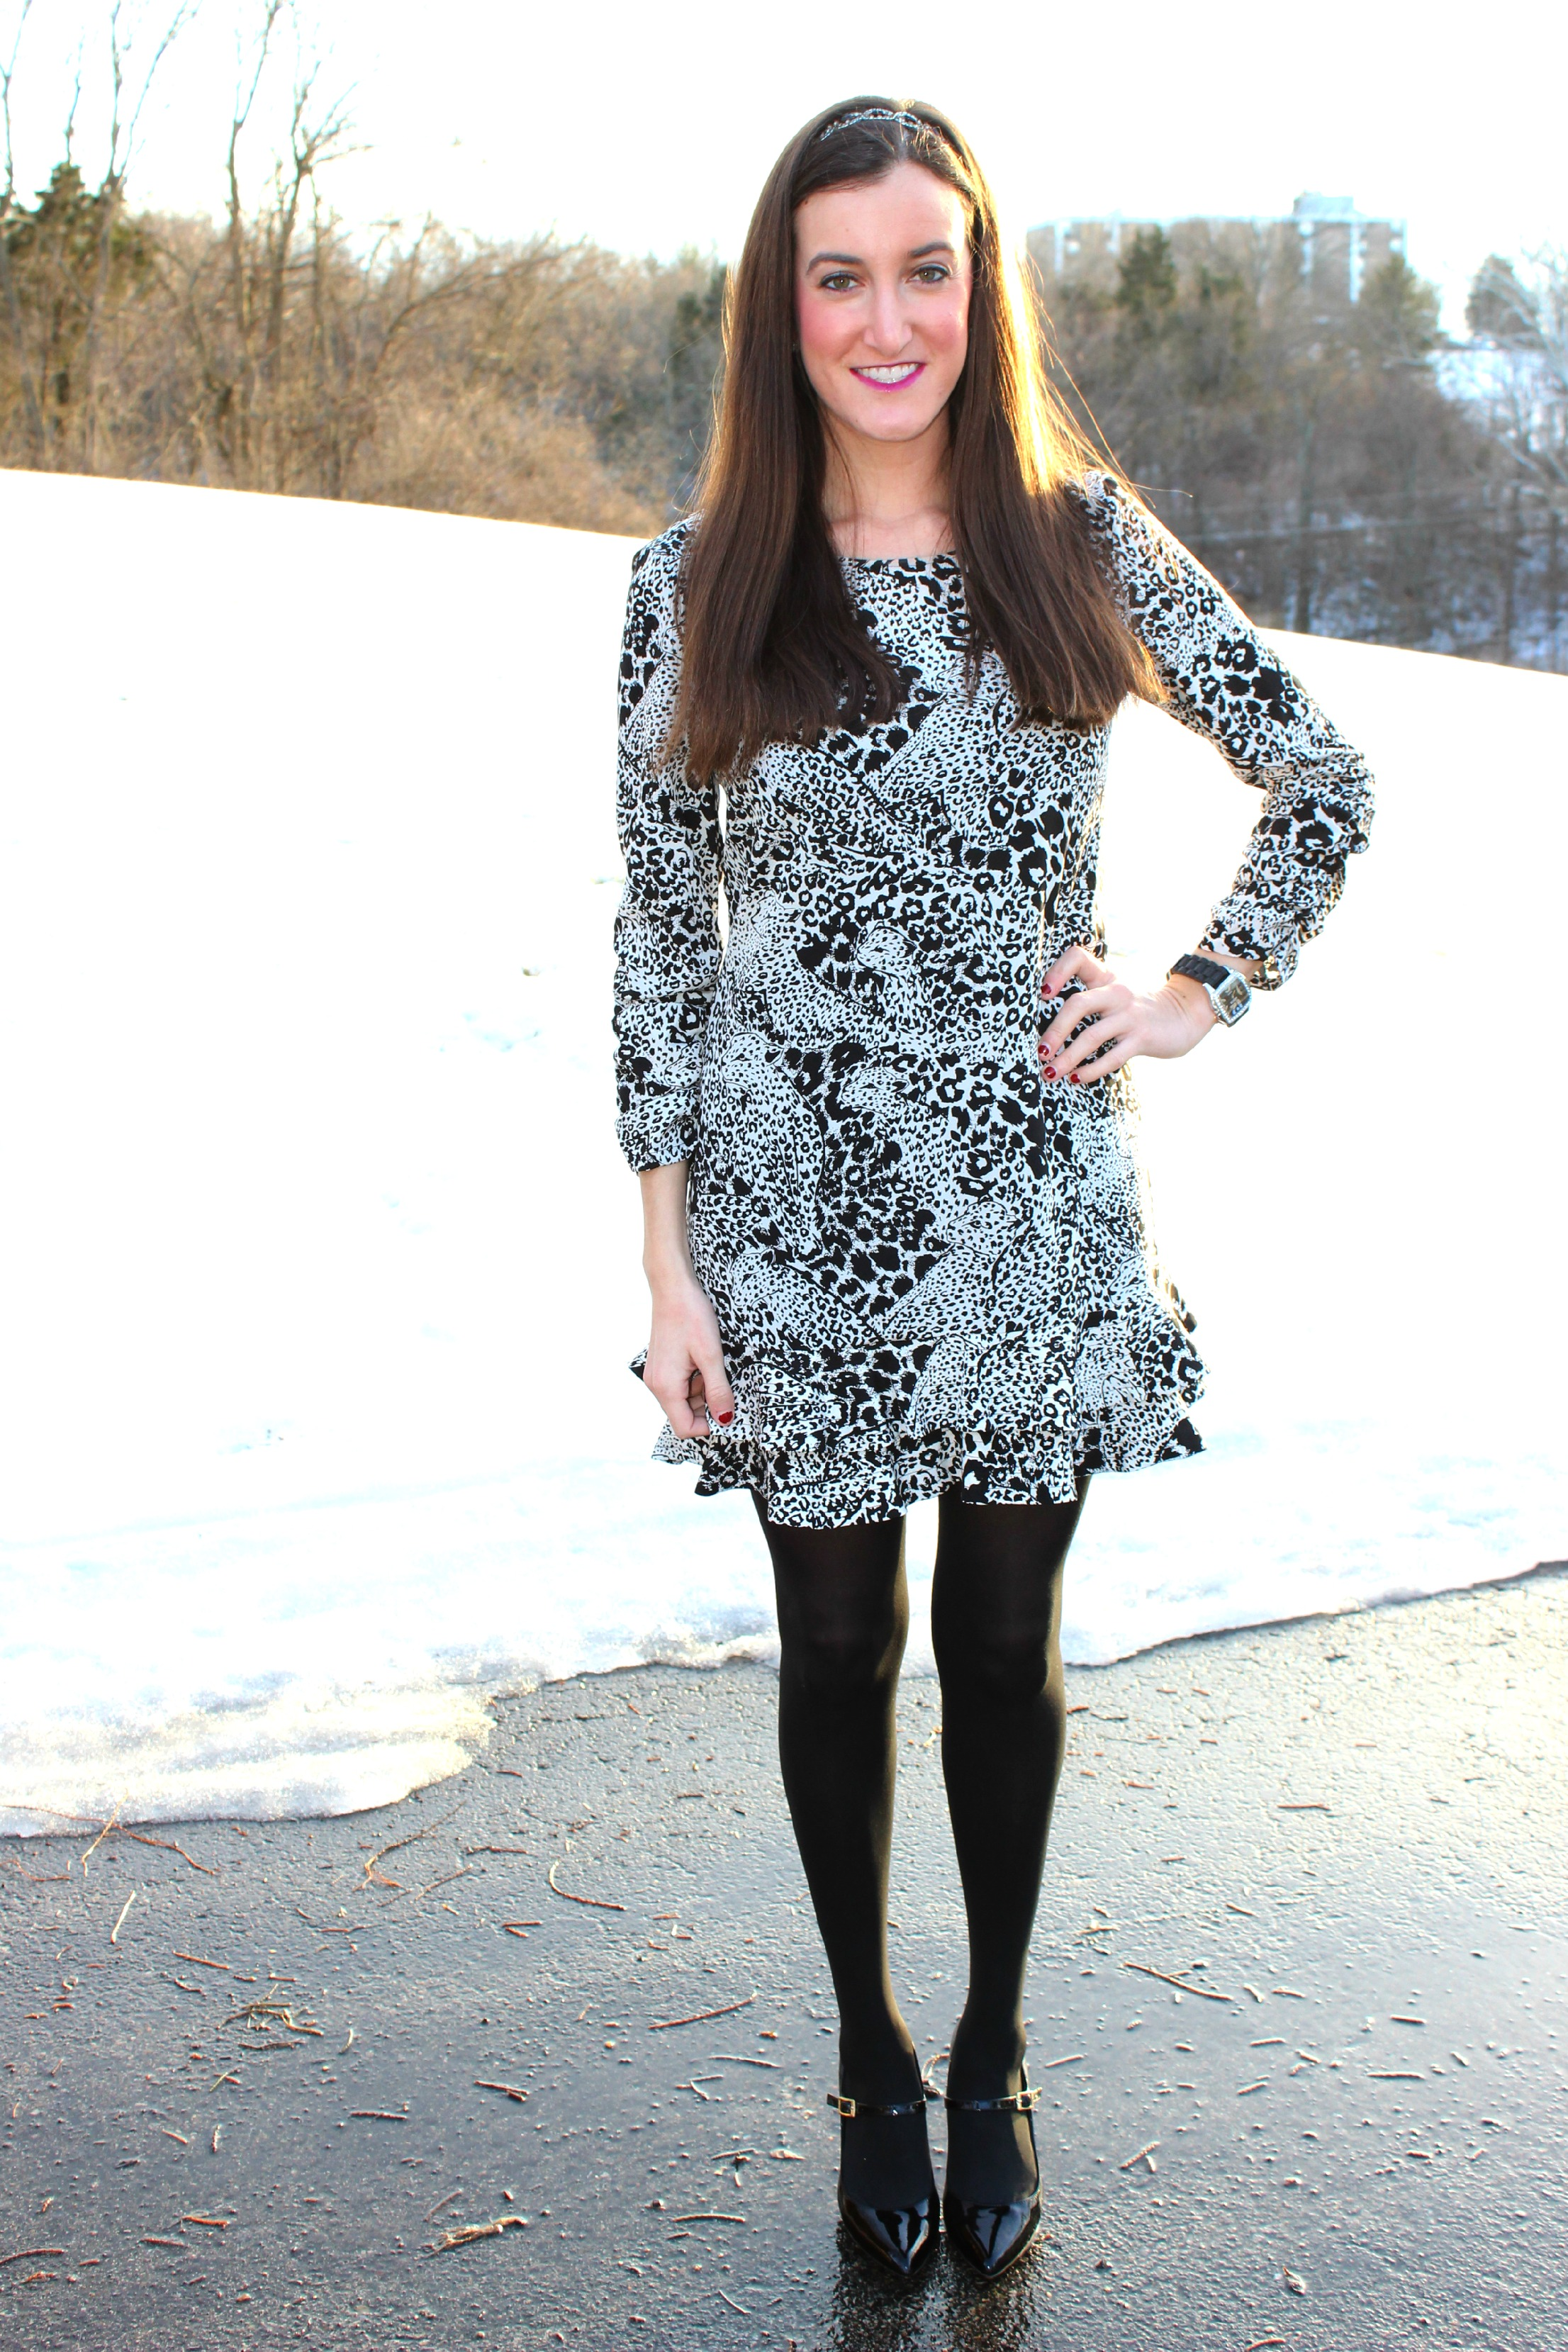 e6a32892ebf13 Black and White Leopard Print Dress